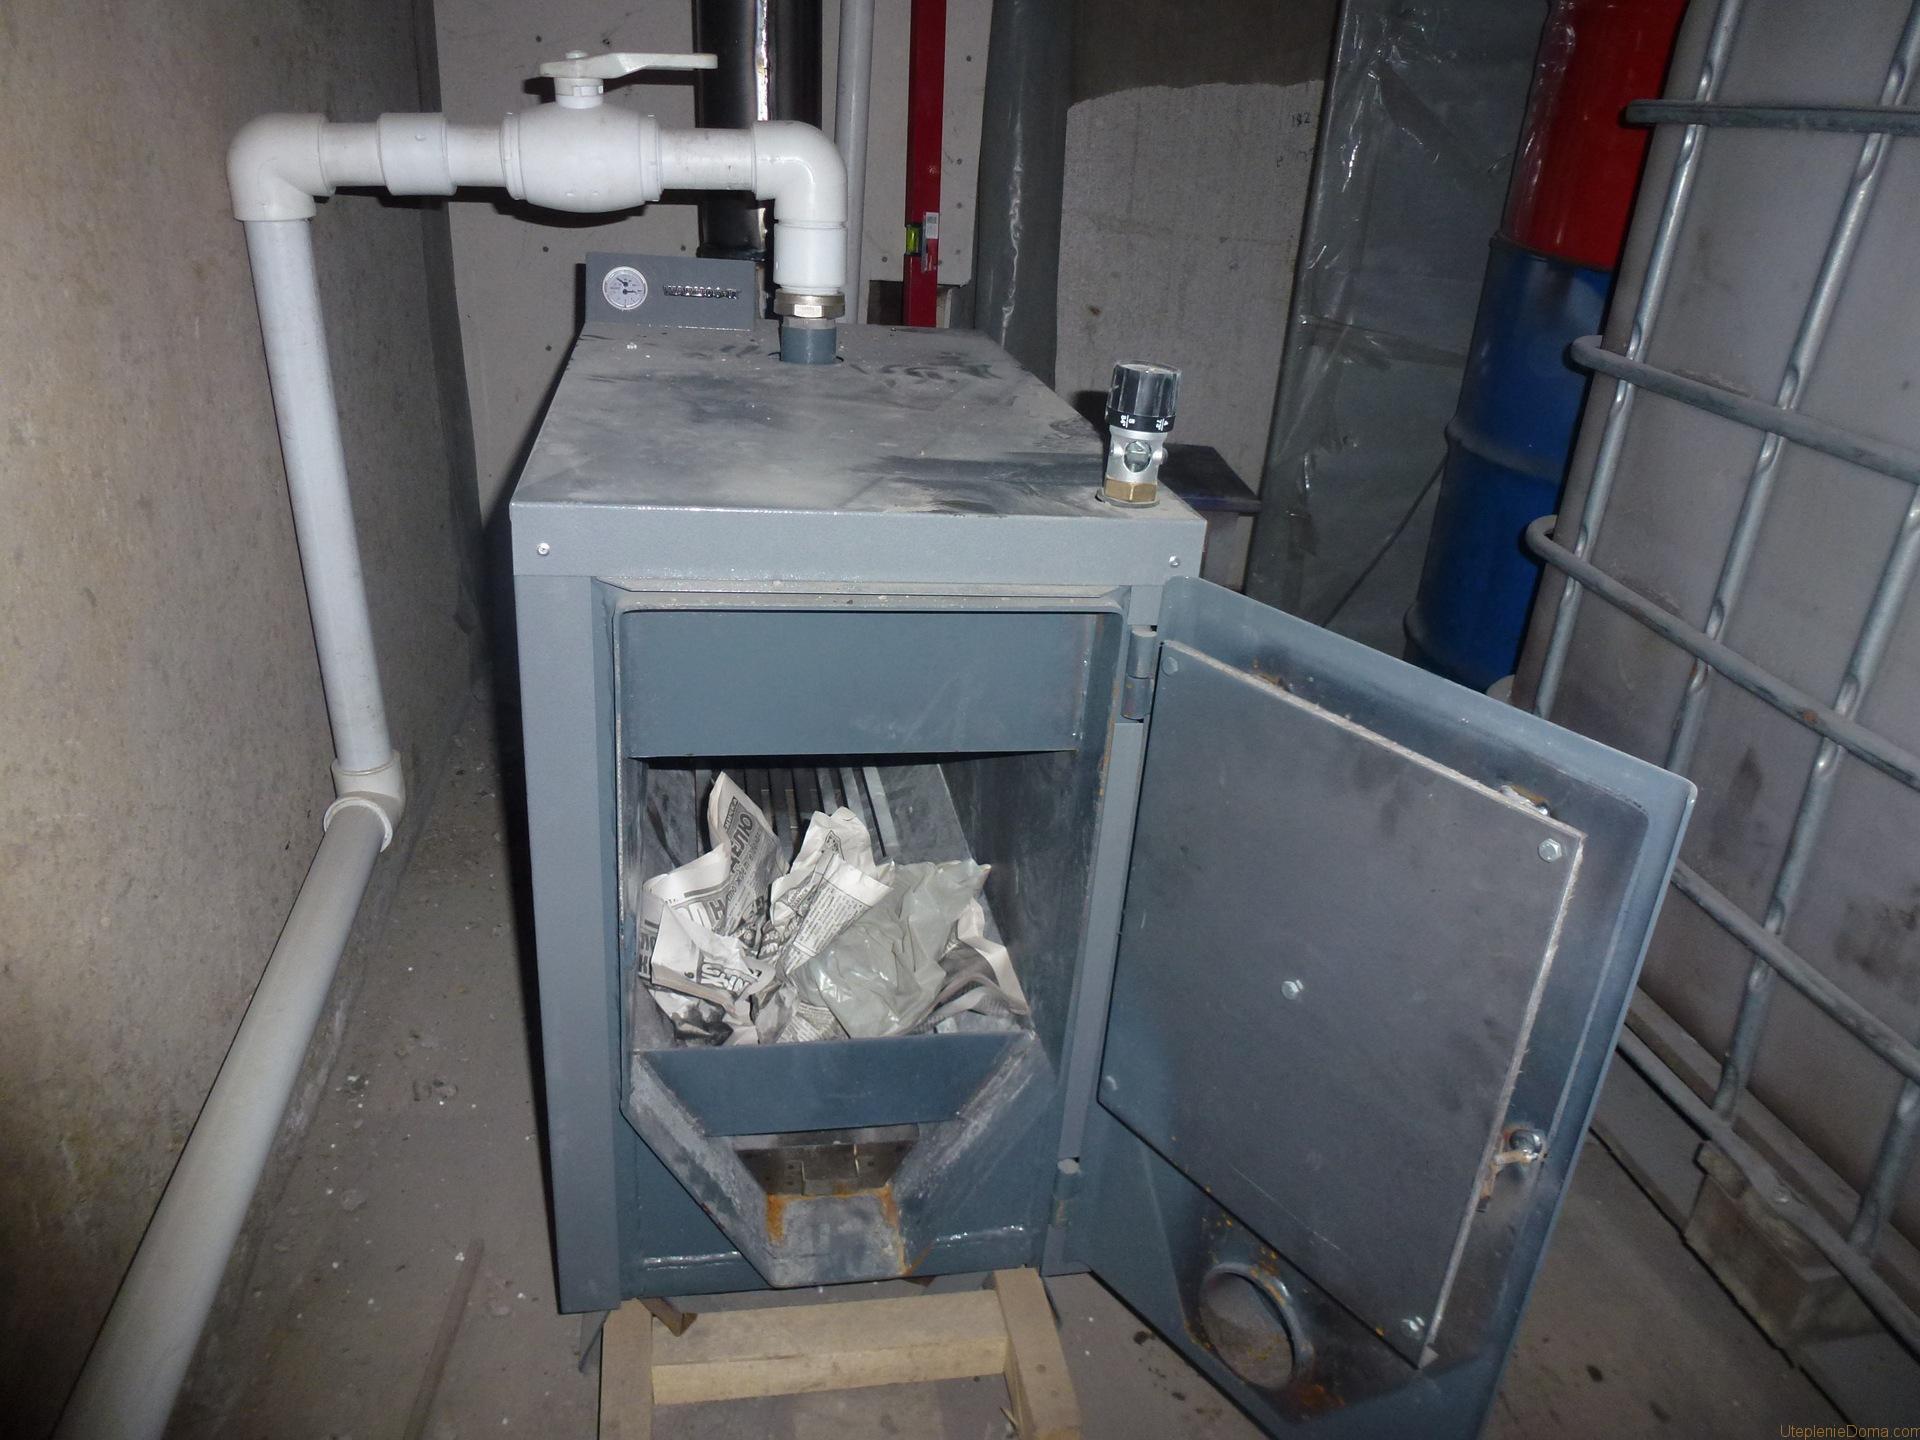 Отопление в гараже от электричества